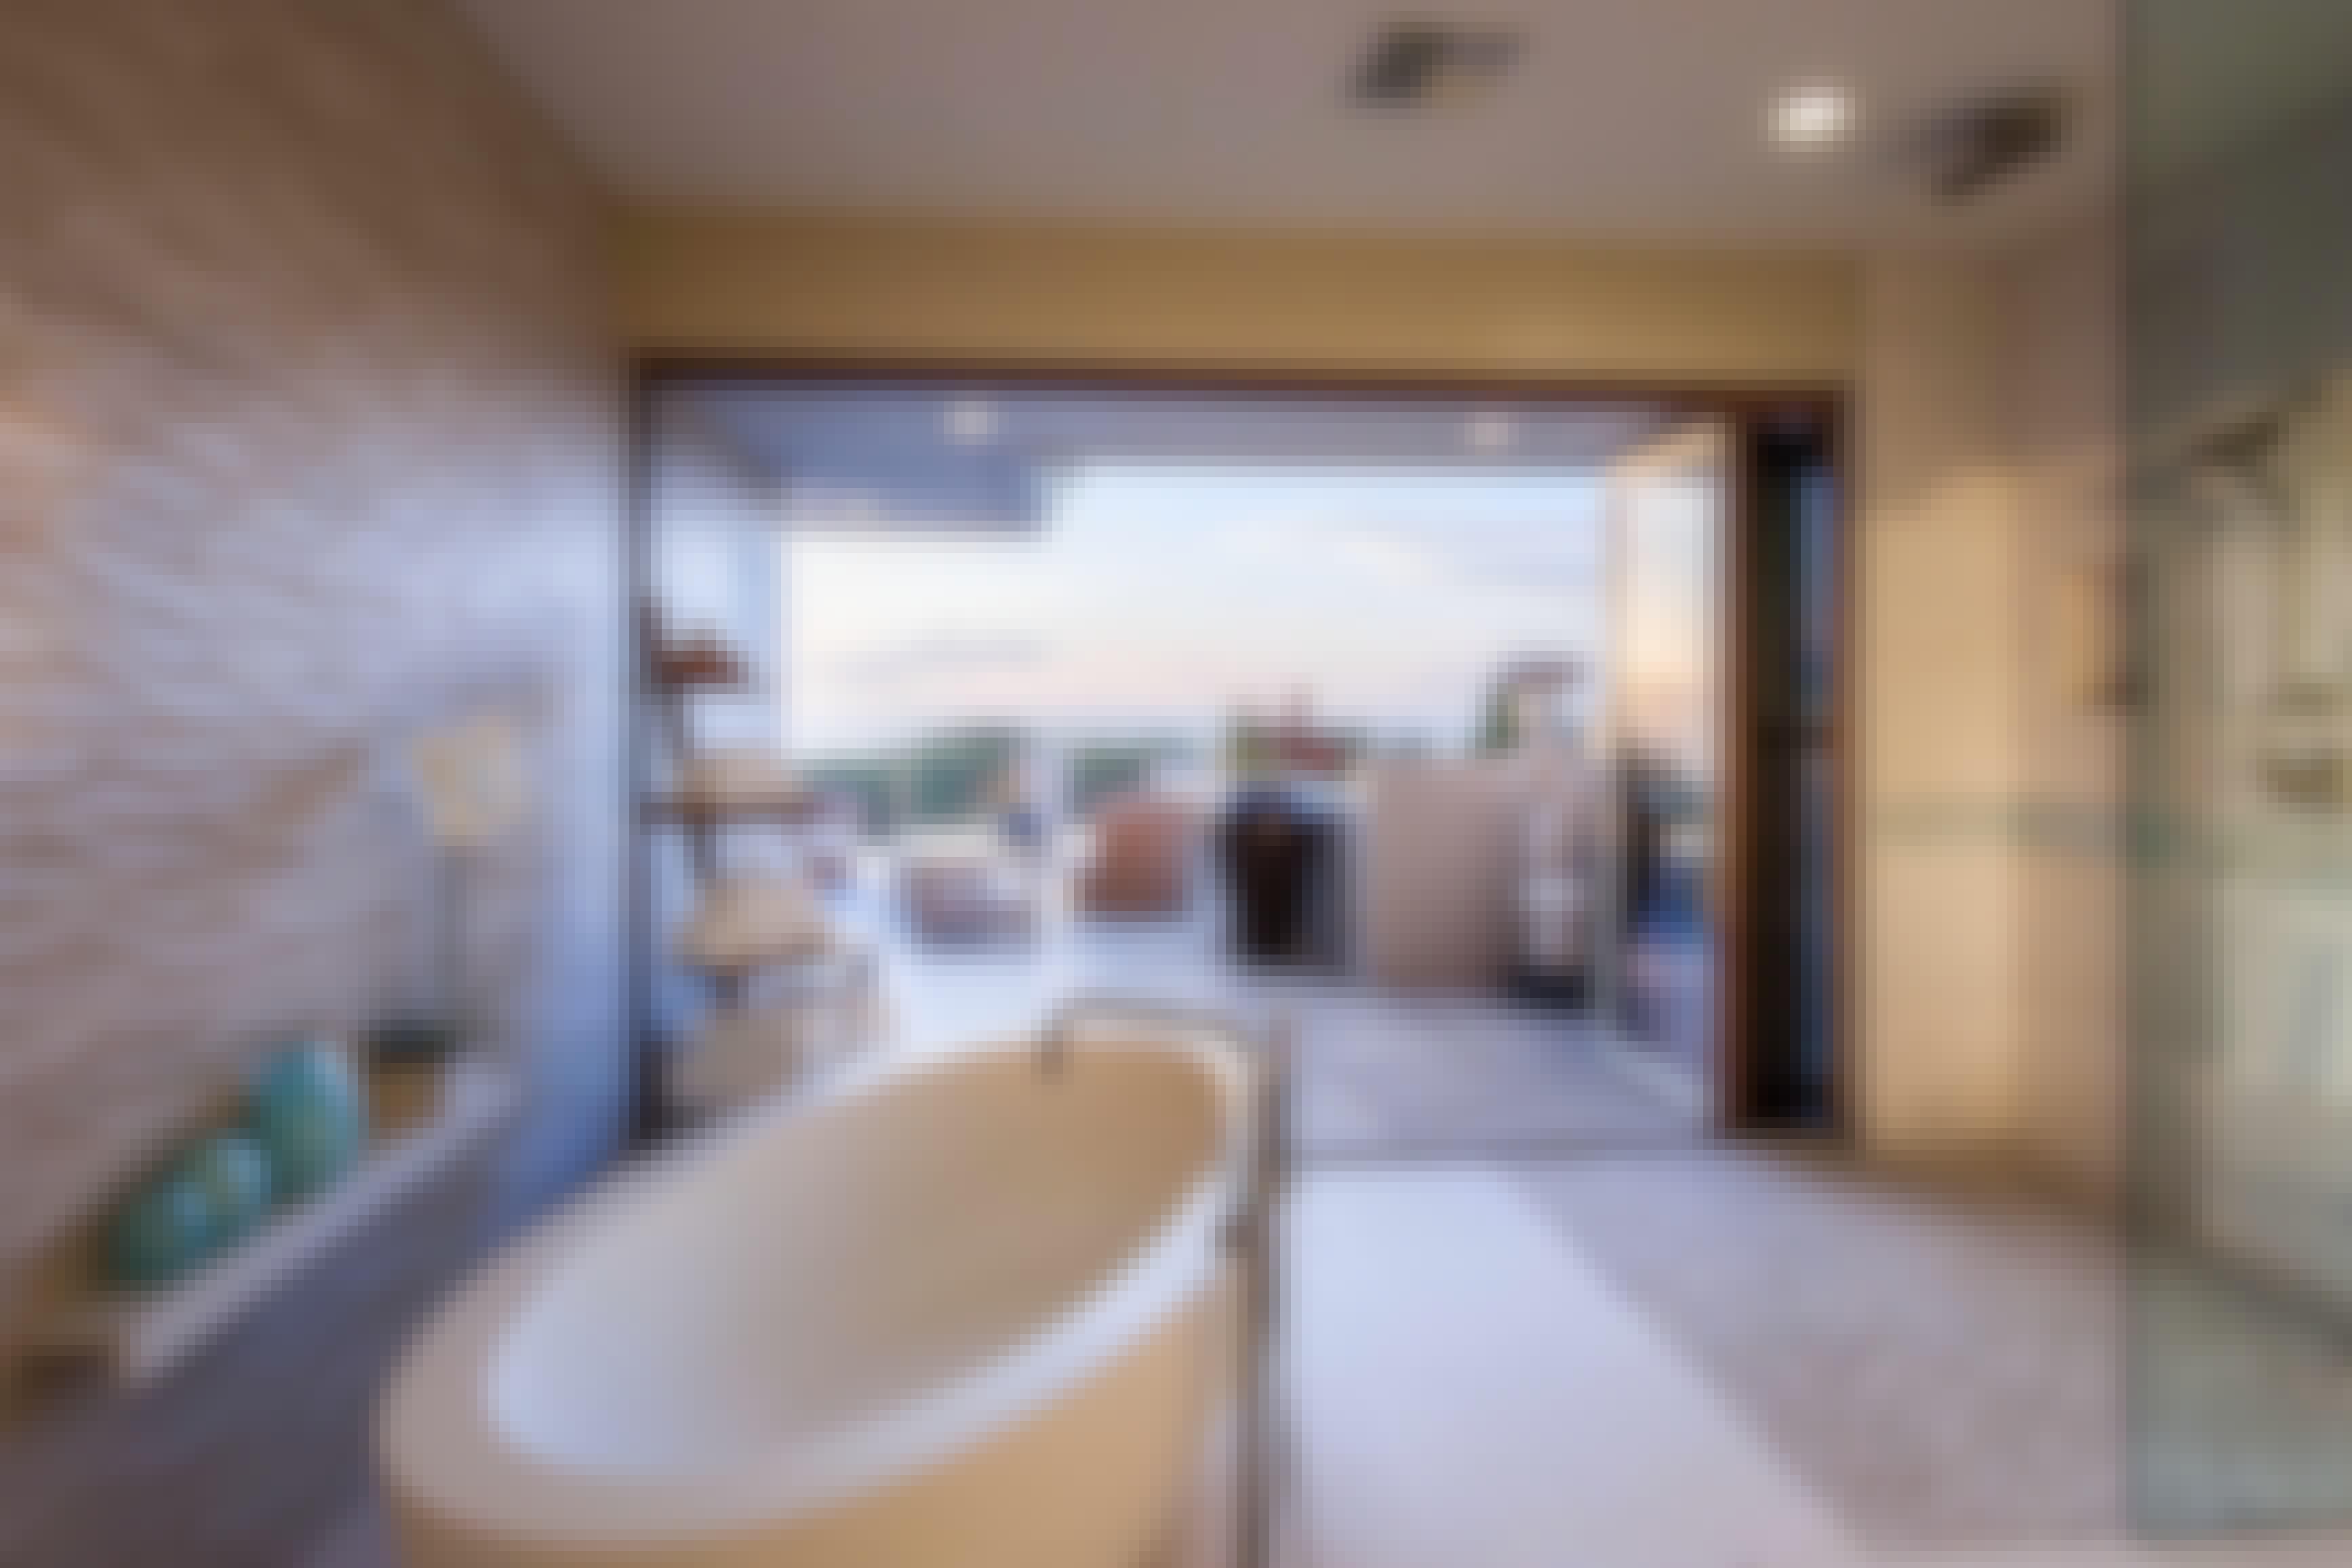 bathroom-with-biophilic-design-principles